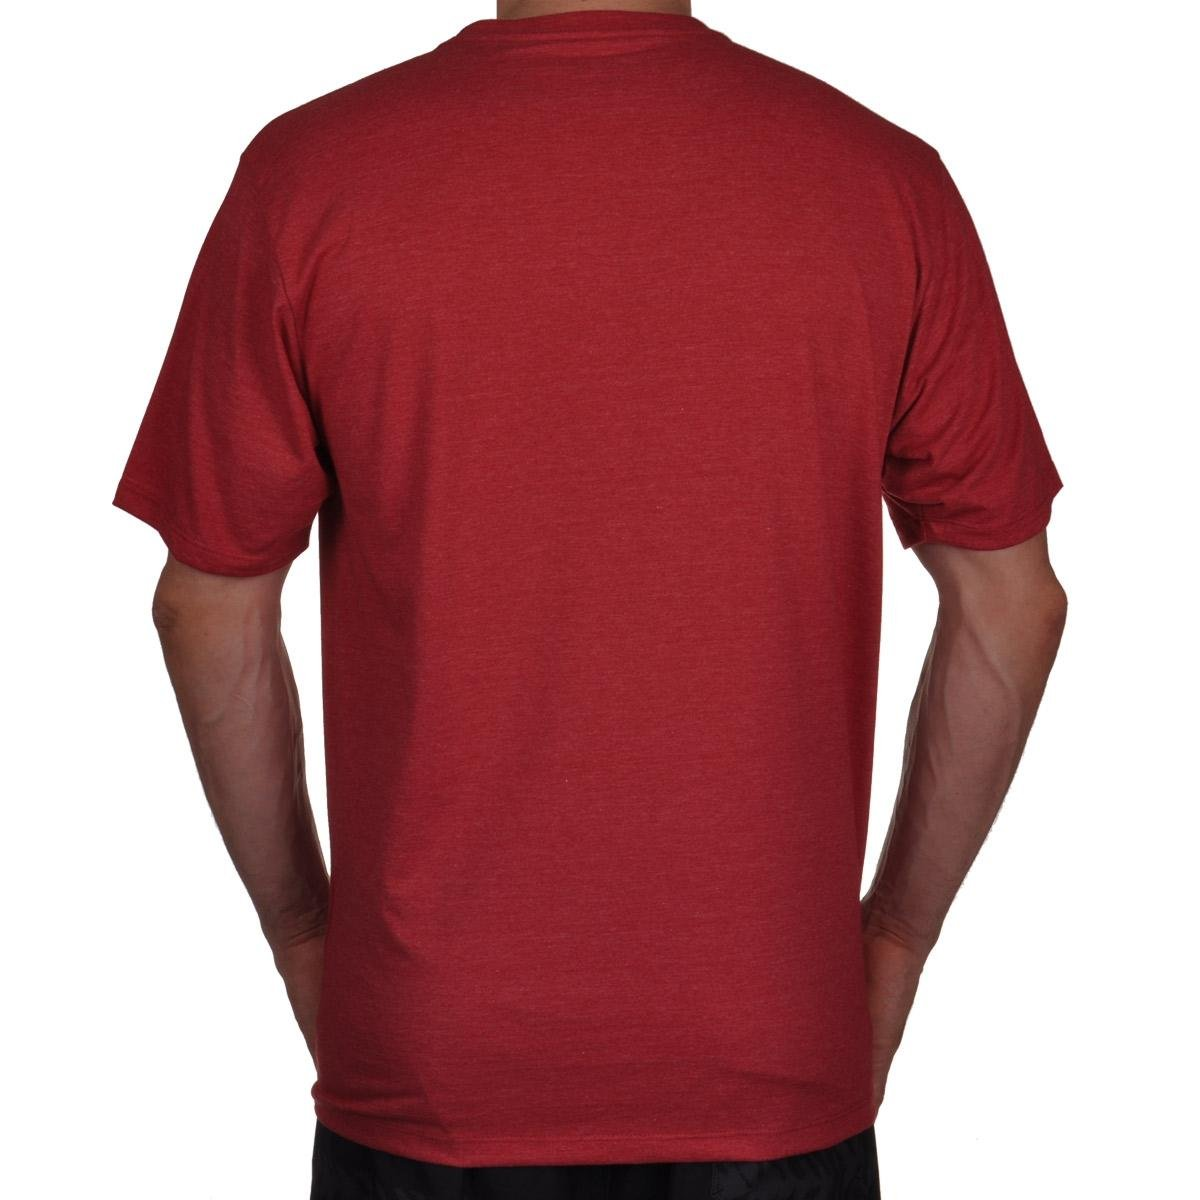 Vermelho Camiseta amp;O Camiseta Hurley Hurley Masculino Silk O 8qn015zw